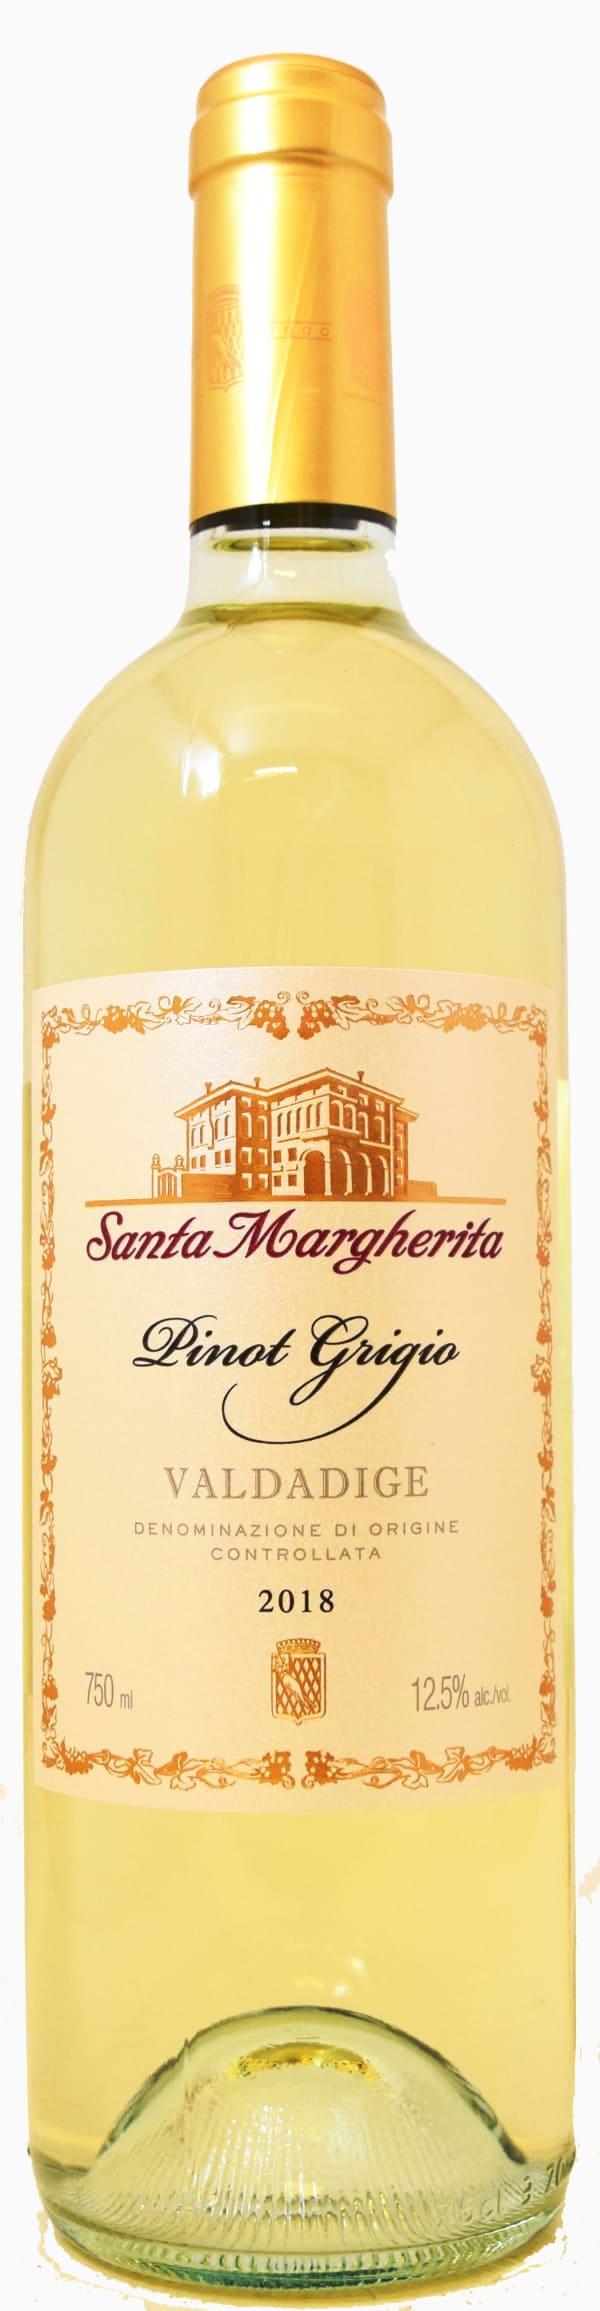 Santa Margherita Pinot Grigio 2017